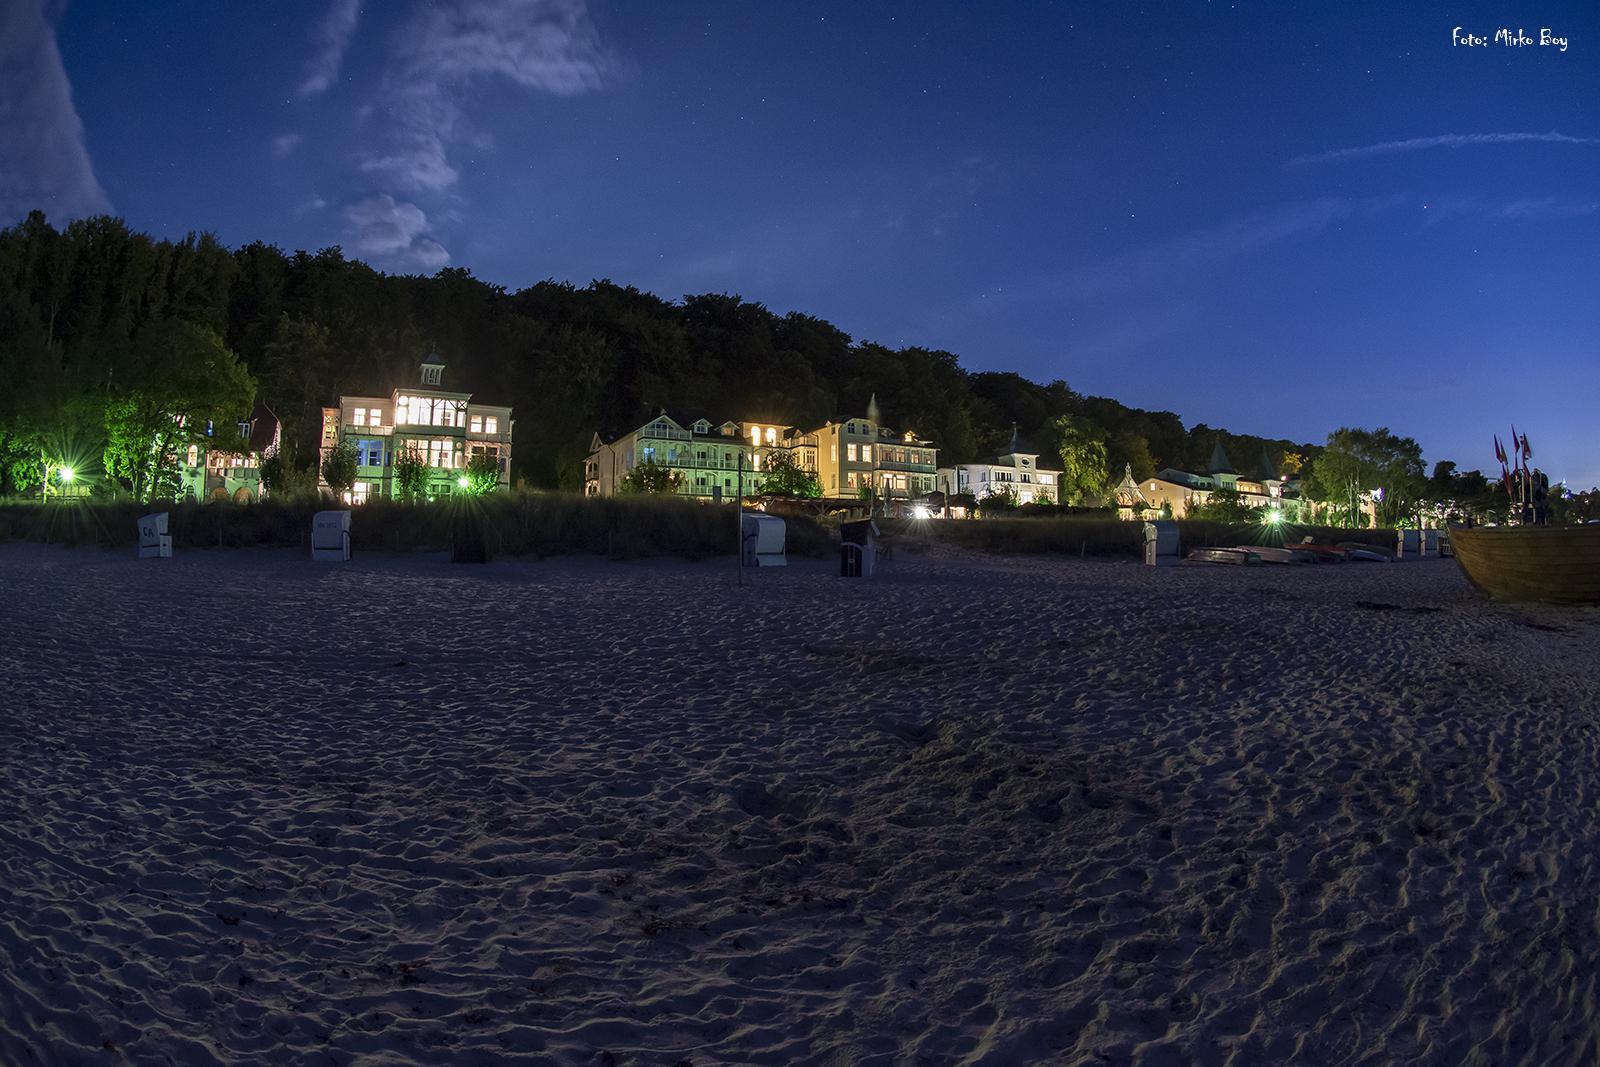 Strandpromenade Binz bei Nacht - Fototouren